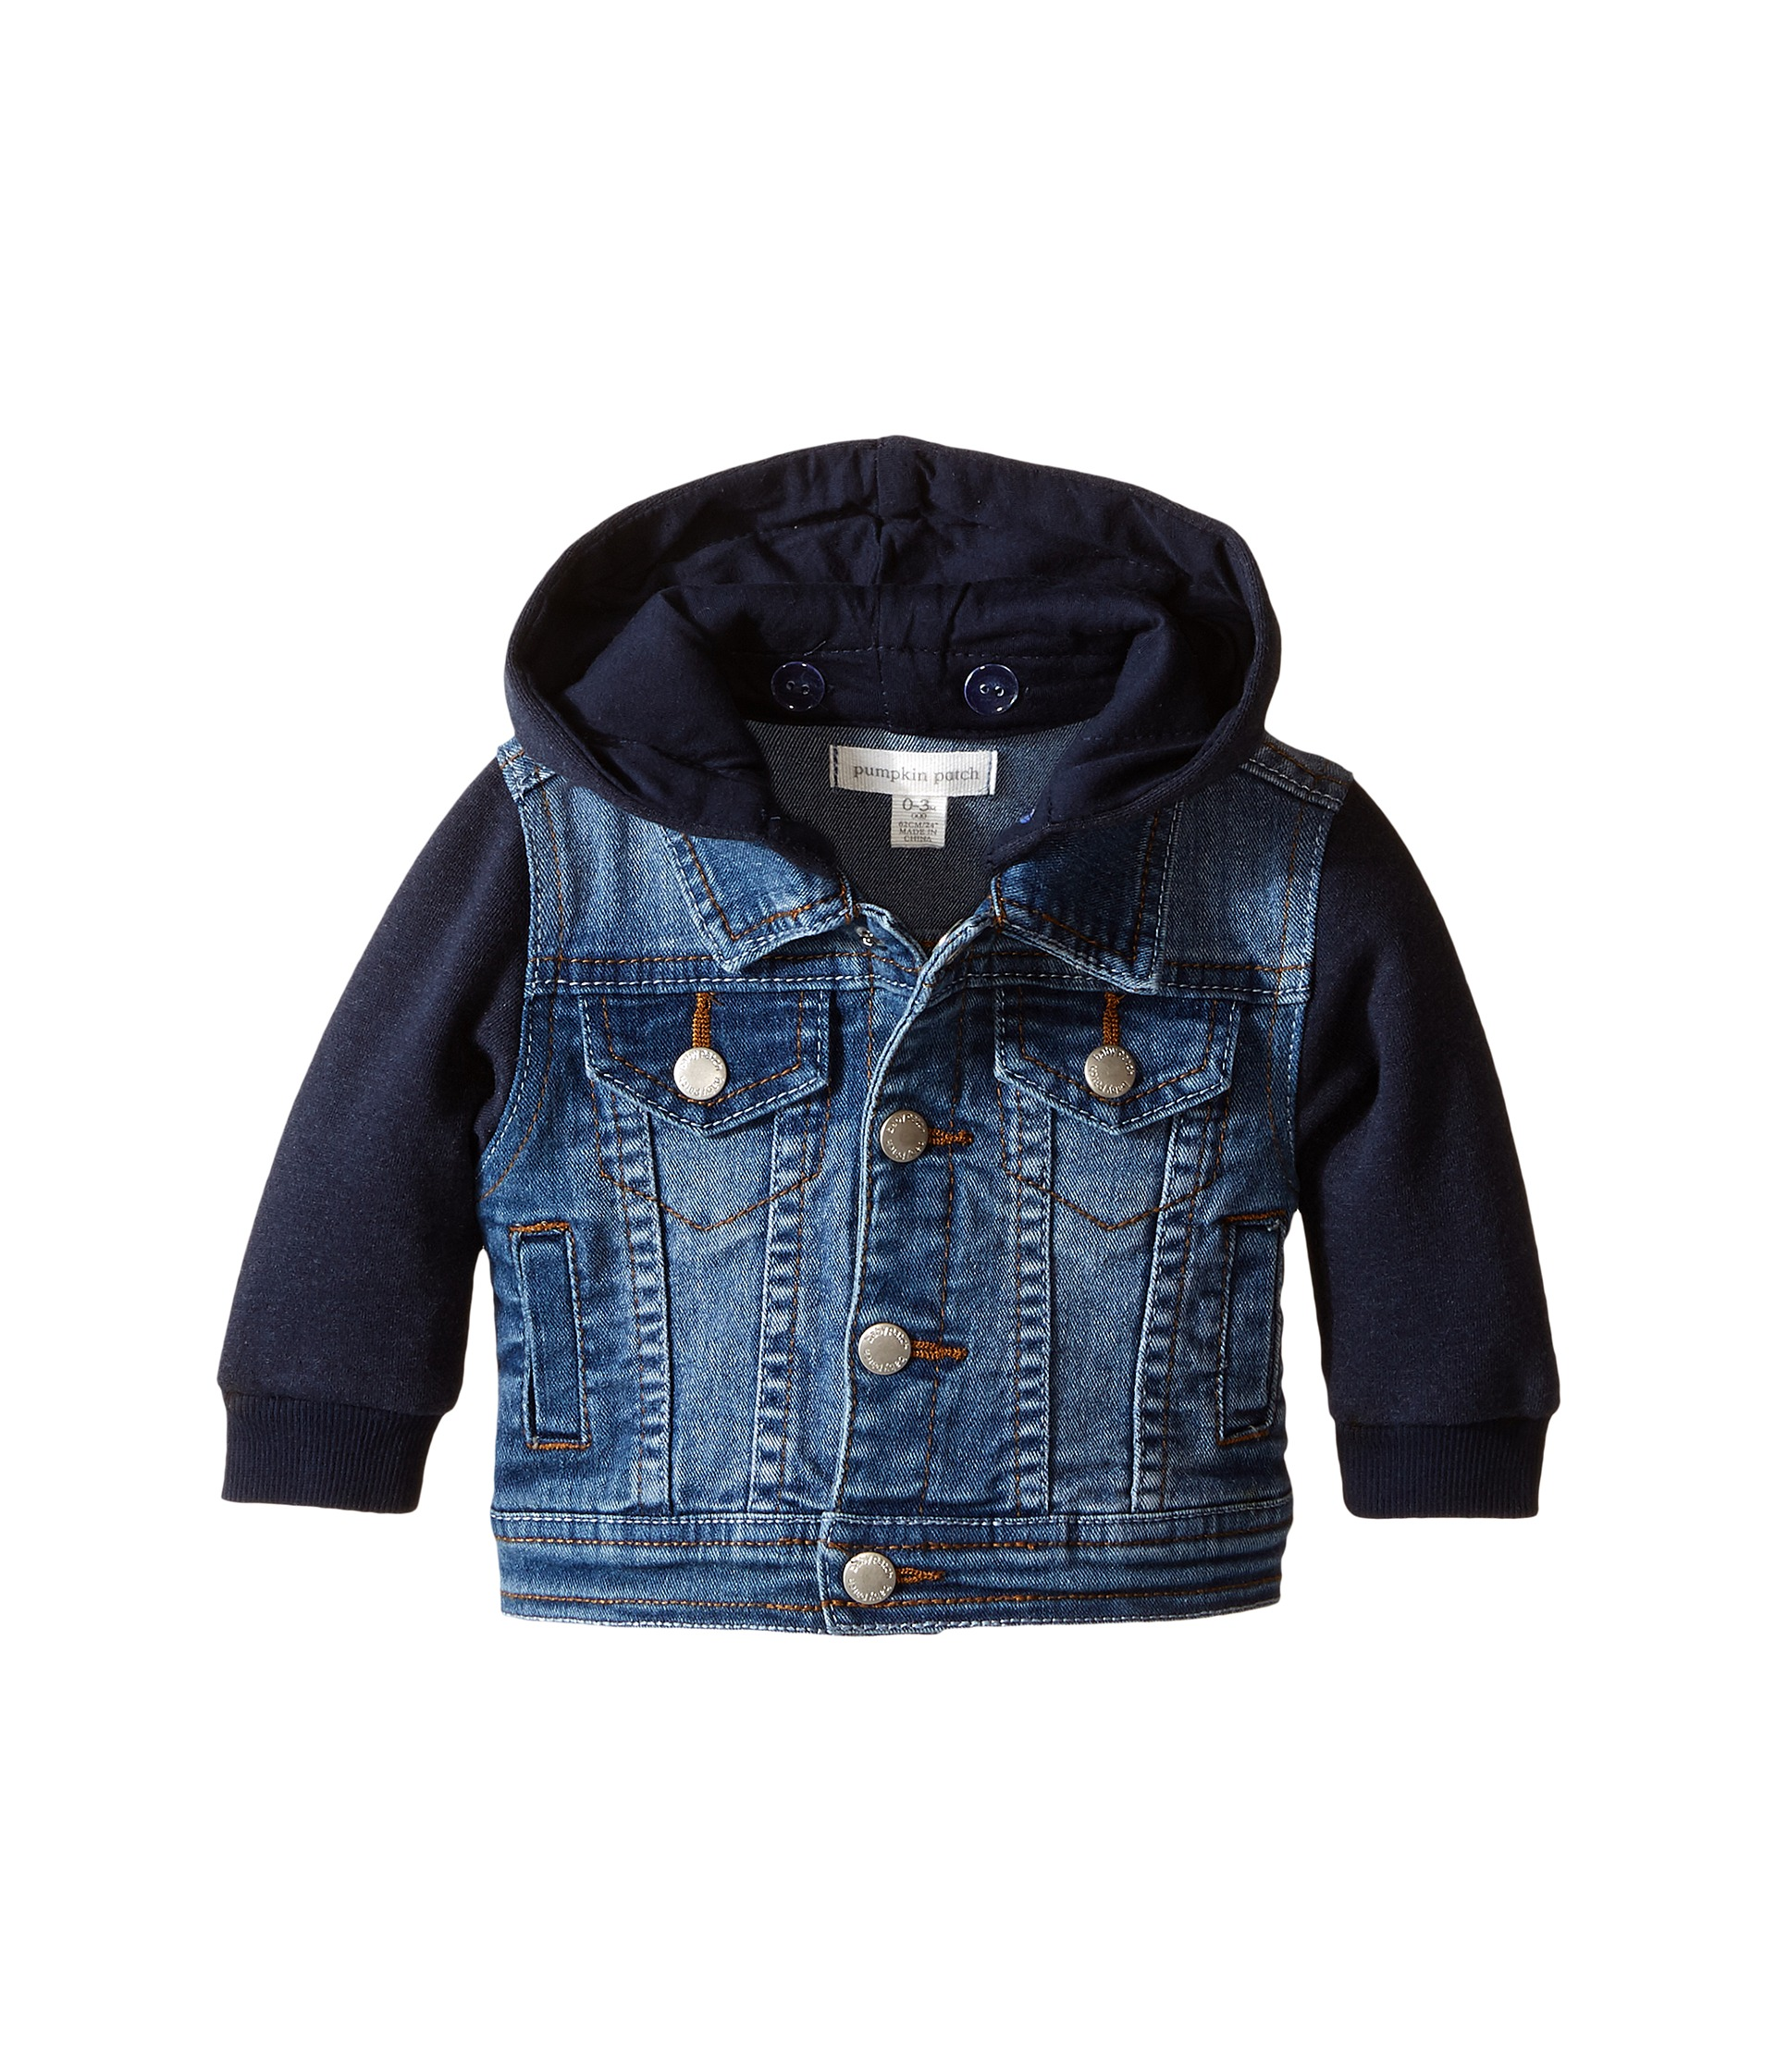 Denim Jacket Knitting Pattern : Pumpkin Patch Kids Knit Denim Jacket (Infant) Denim - Zappos.com Free Shippin...